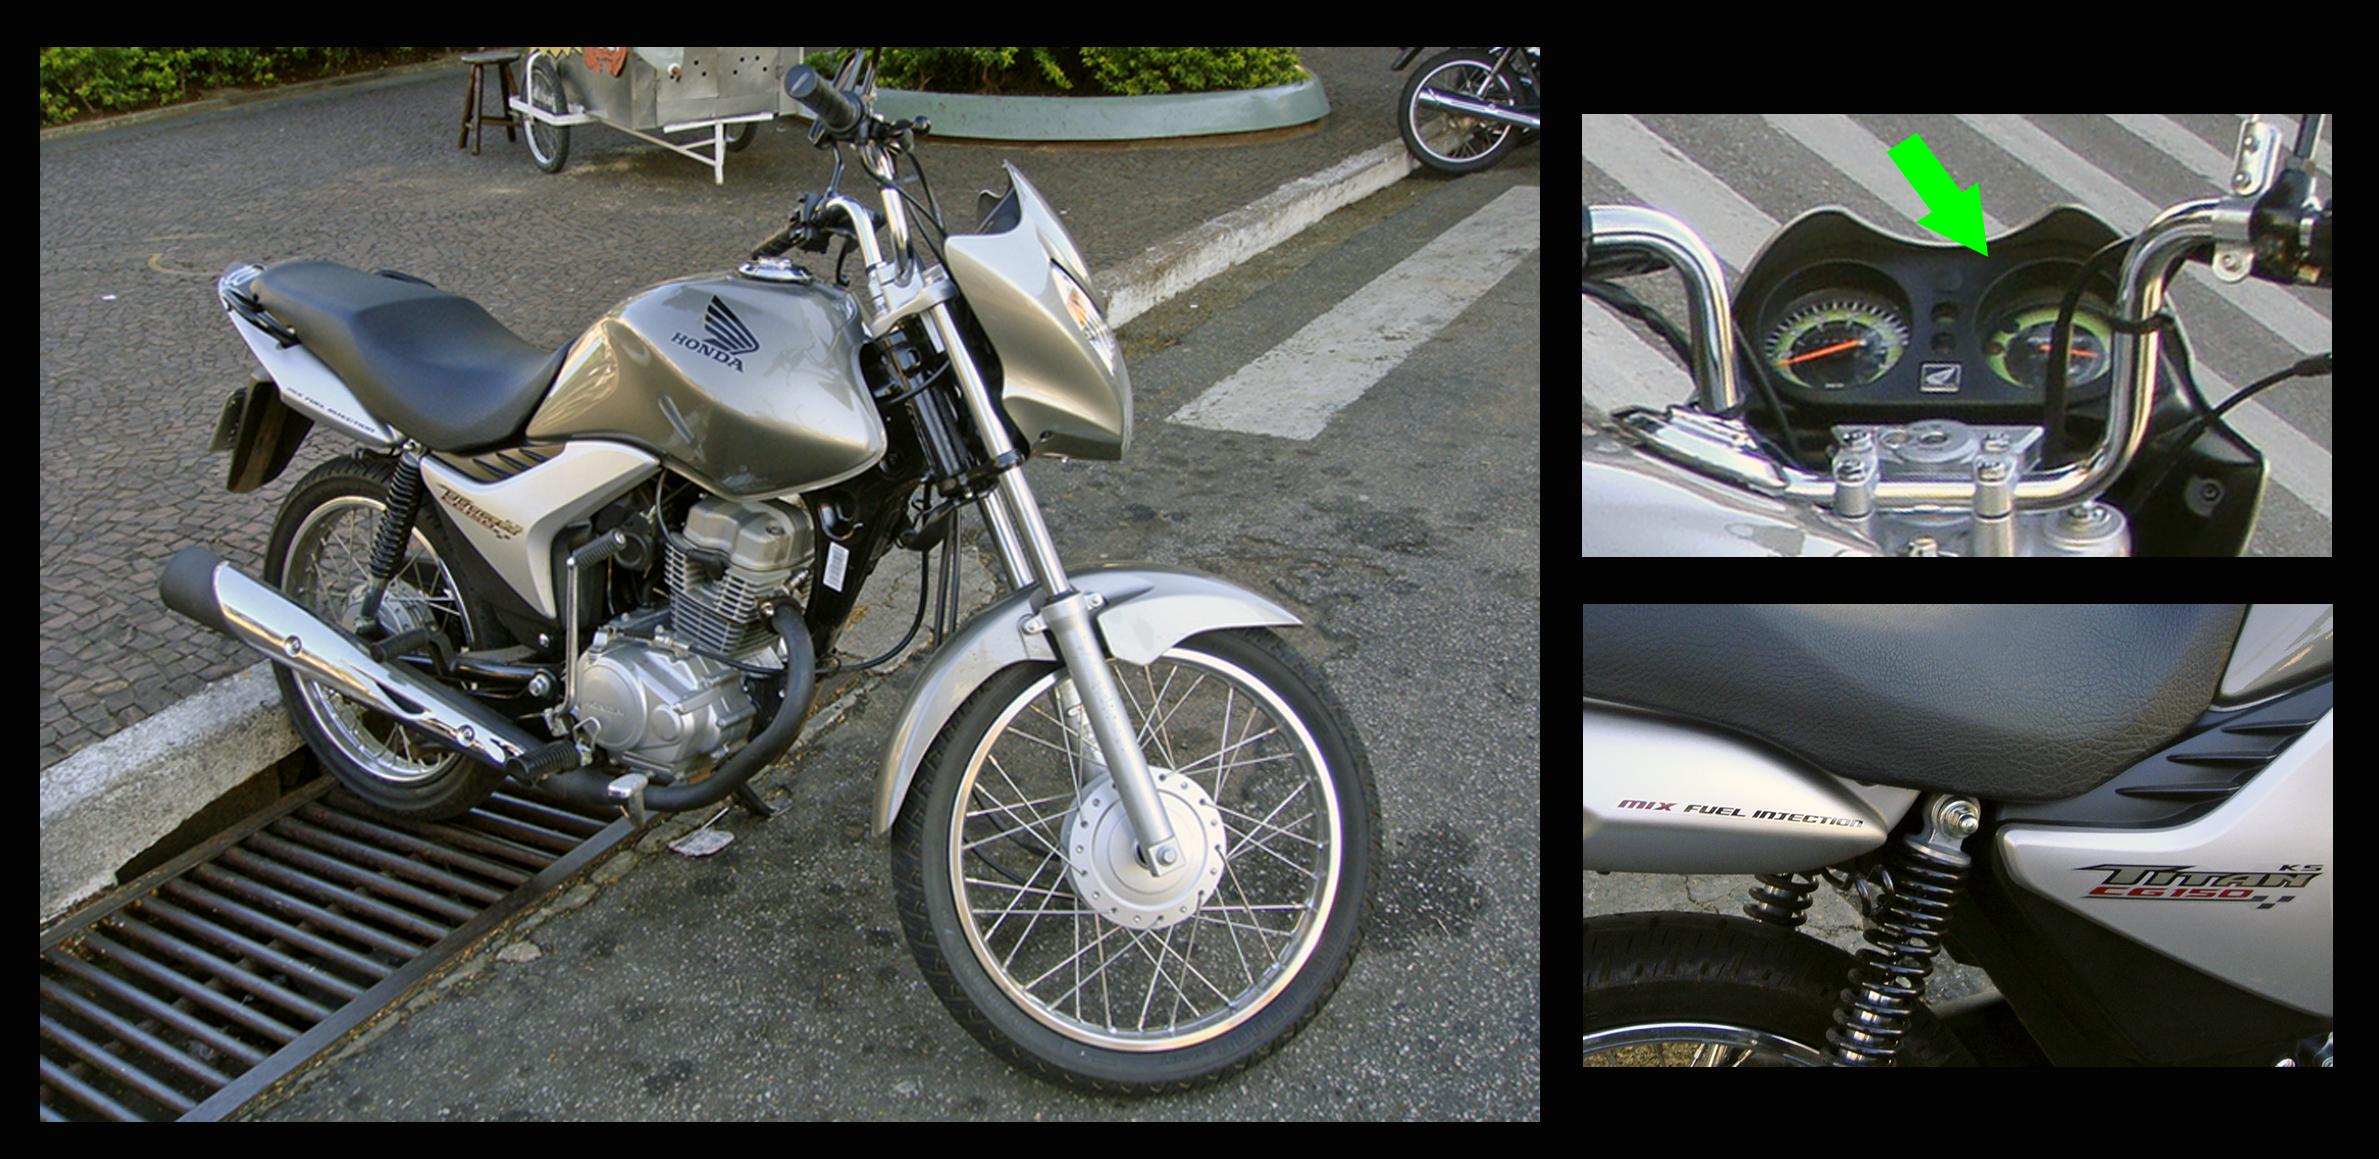 File:3 Views Honda Flex an CG 150 Mix Fuel Injection 06 ... on